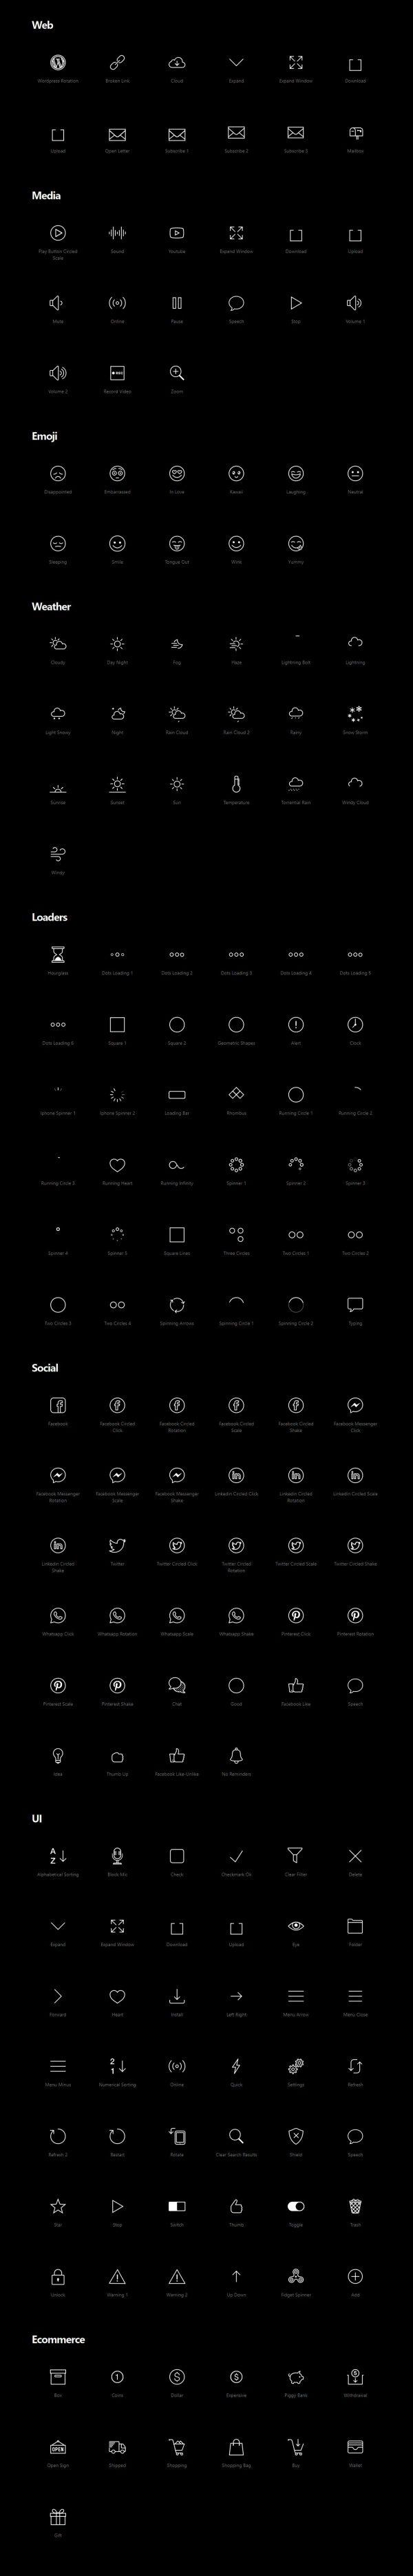 Animated Icons - 200 Free Icons